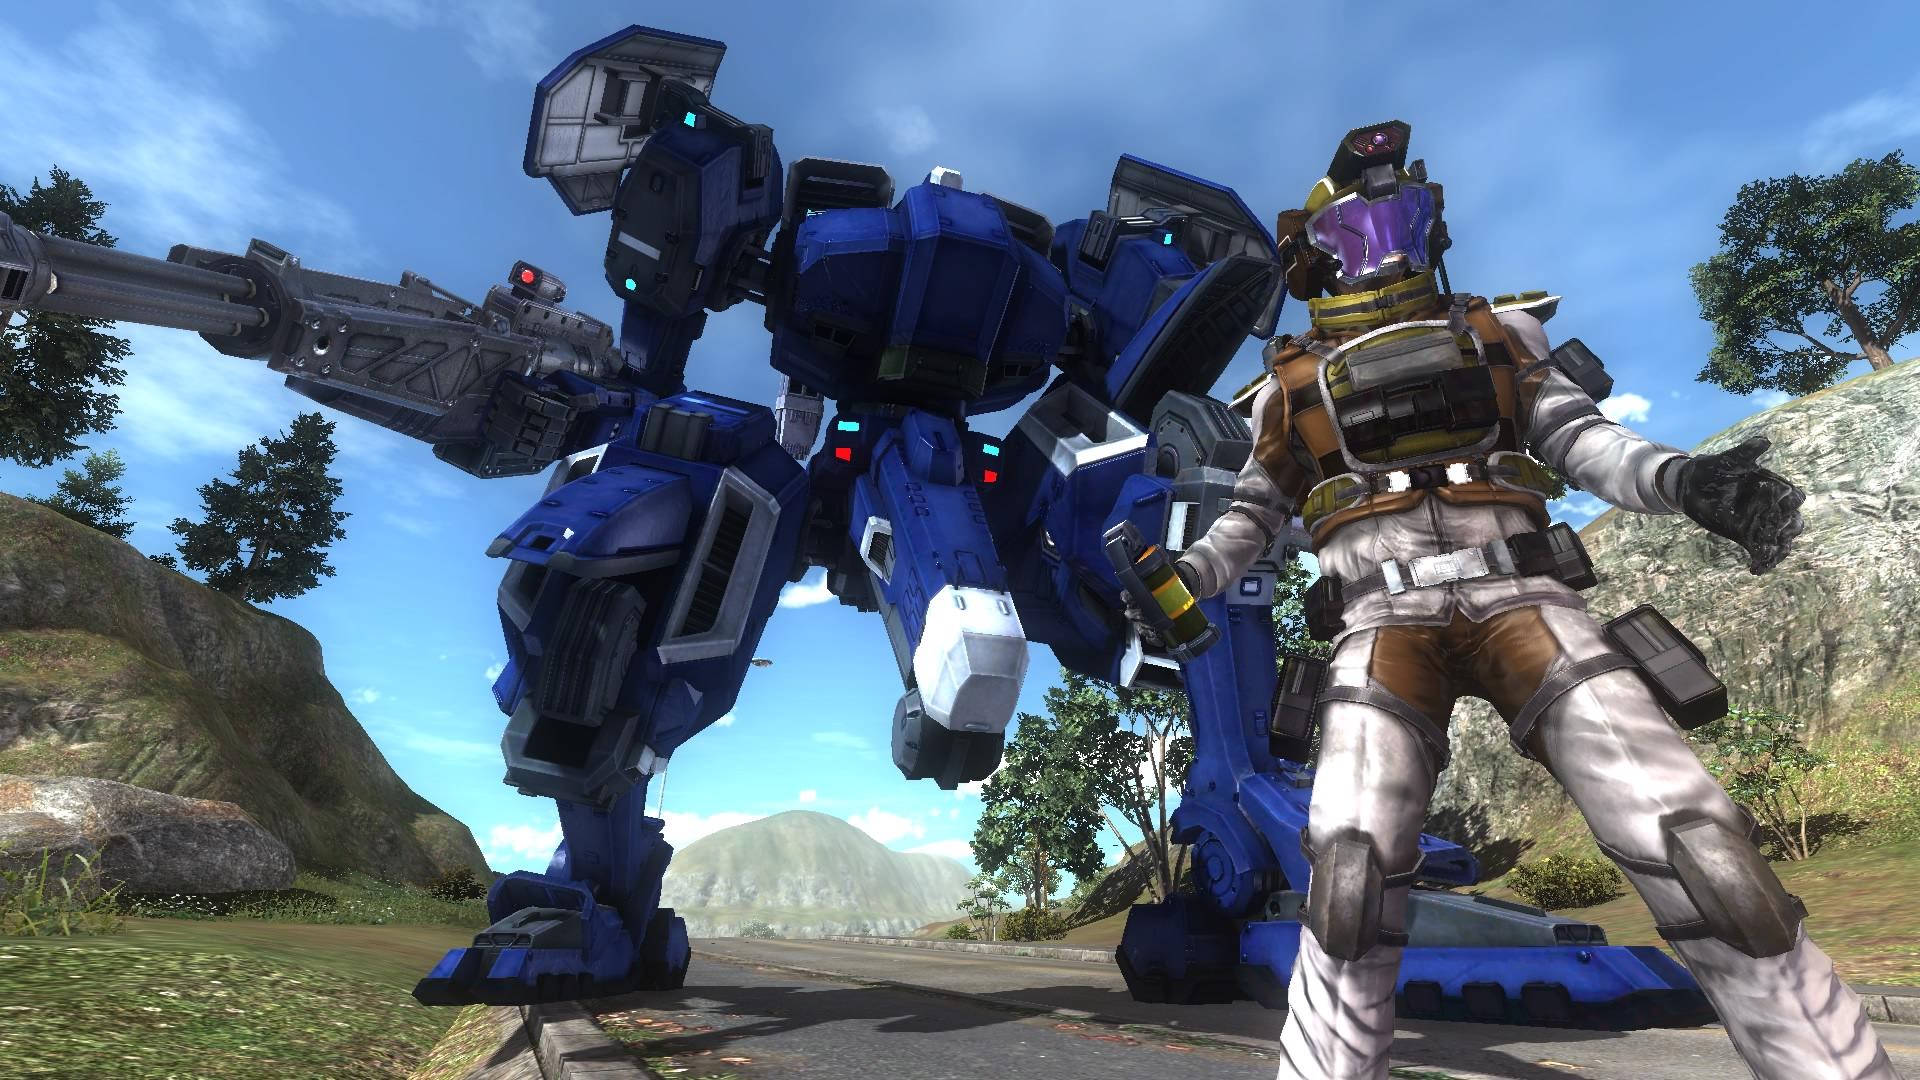 D3 Publisher продемонстрировала трейлеры для Earth Defense Force 6  и ремастера Earth Defense Force 2